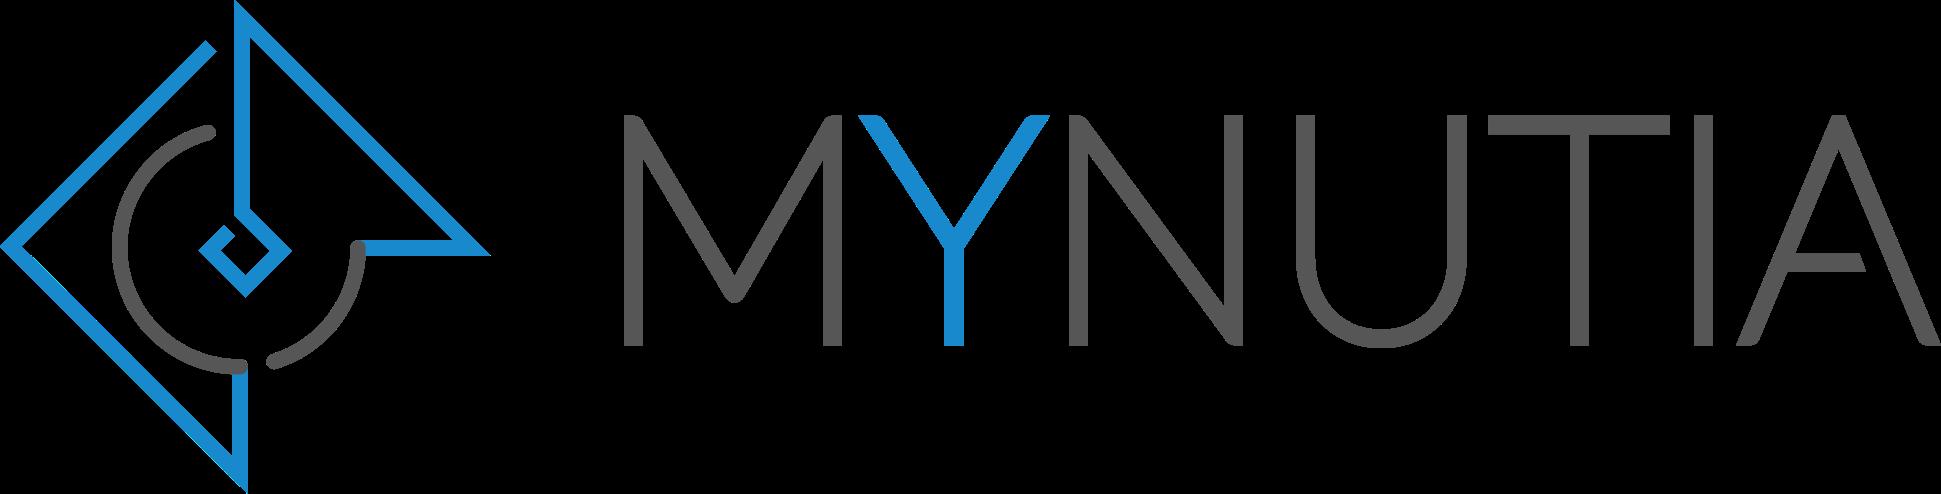 Mynutia Eye surgery logo